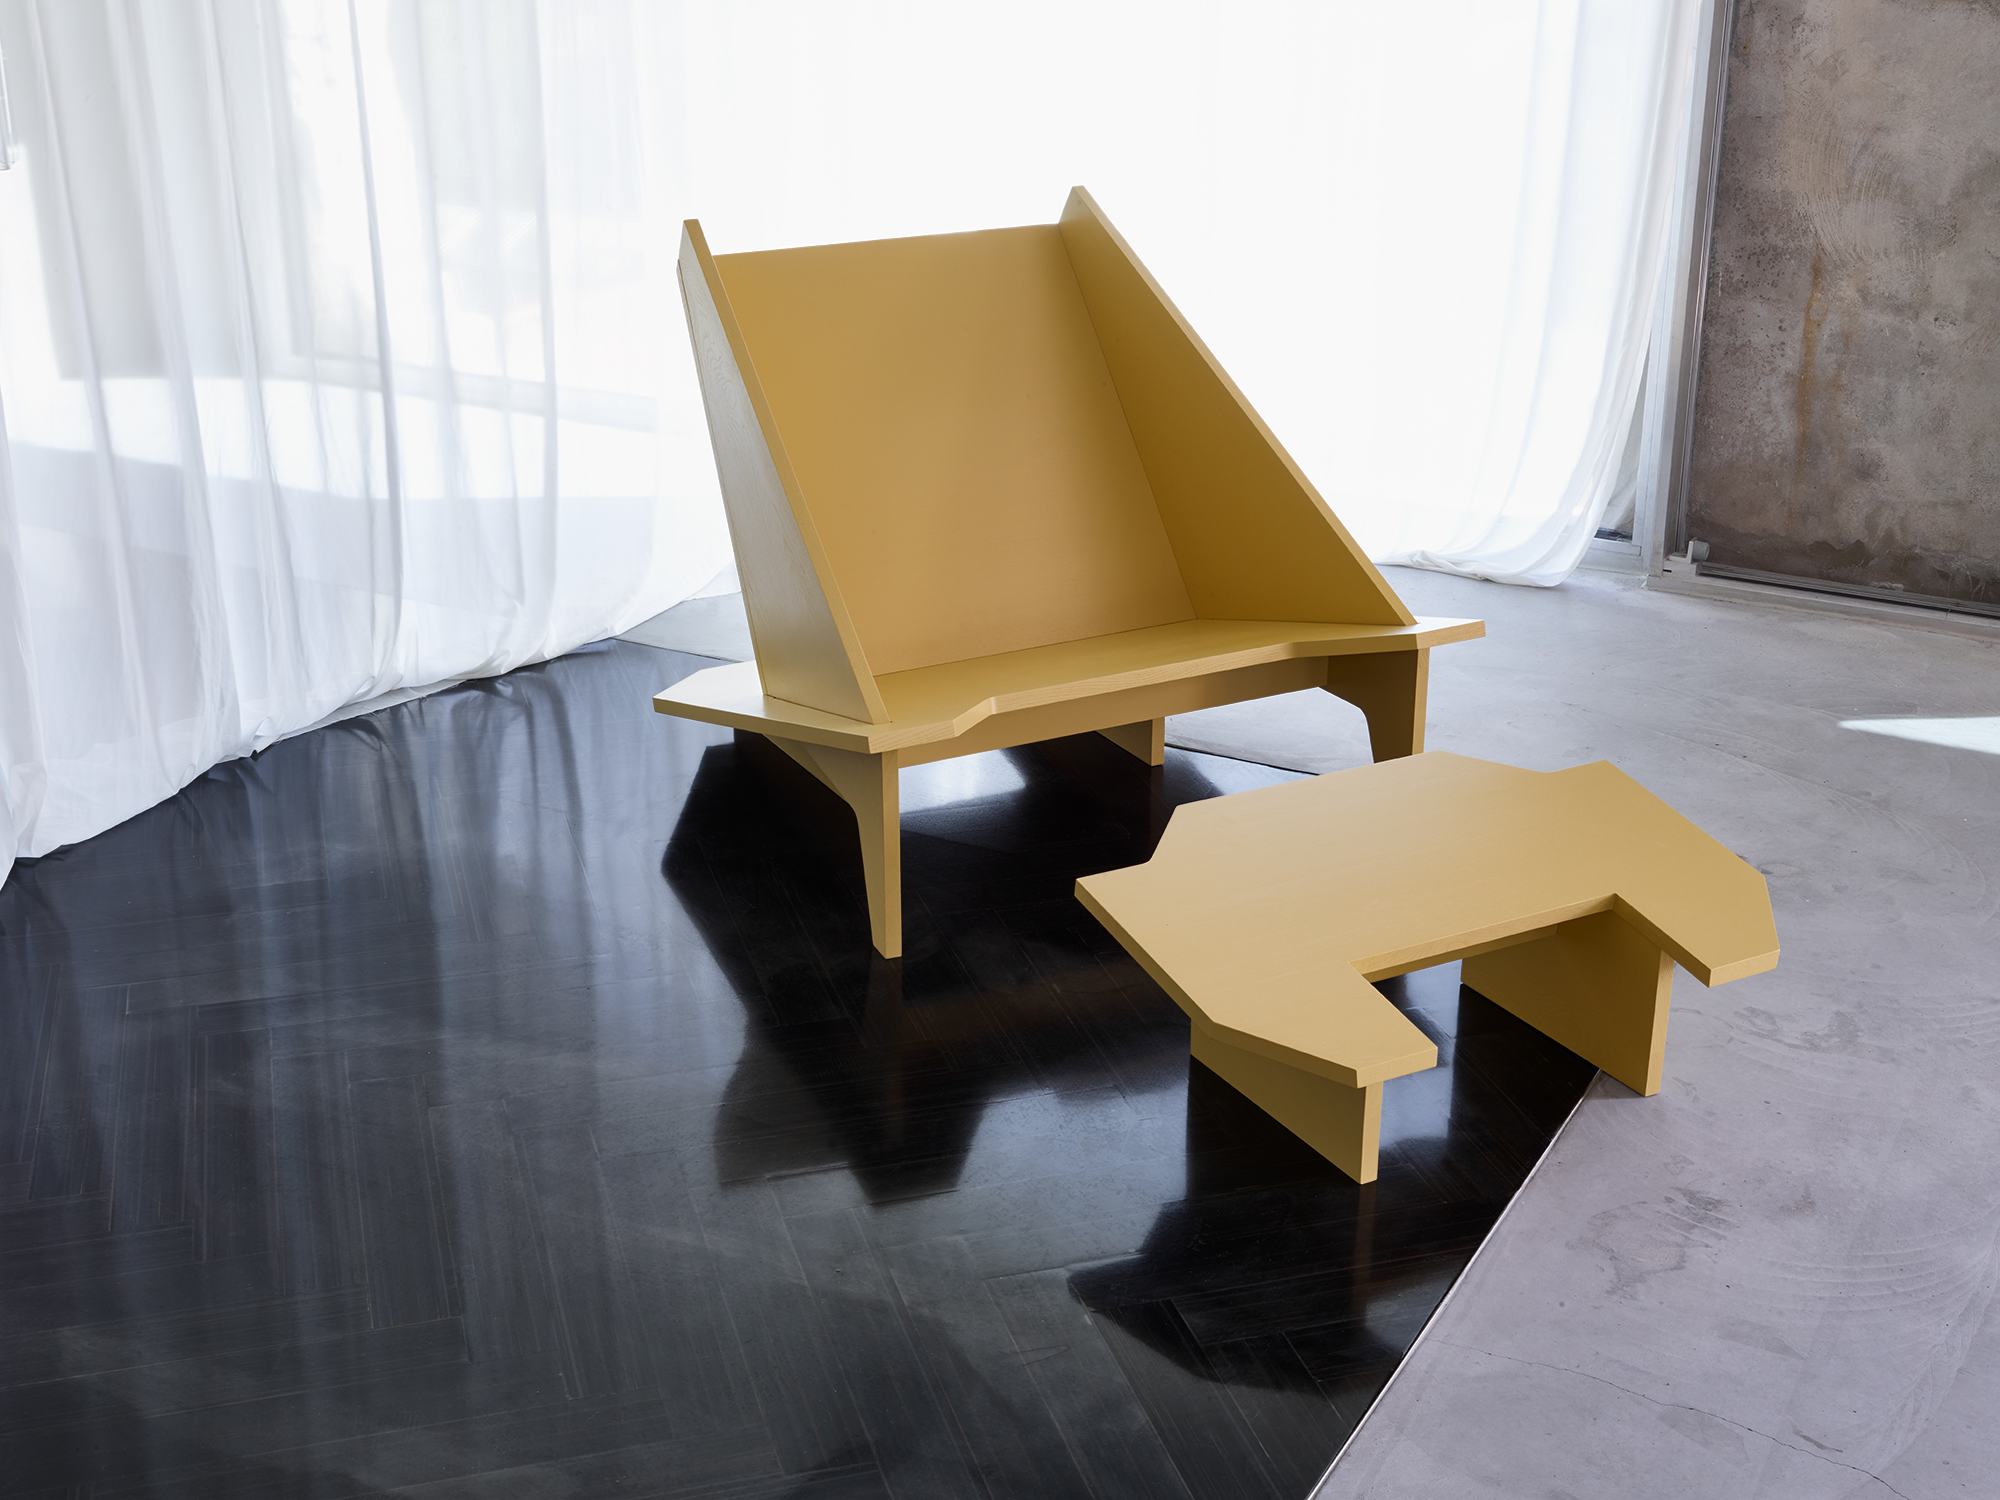 objekte-unserer-tage-3407-villa-18-takahashi-lounge-chair